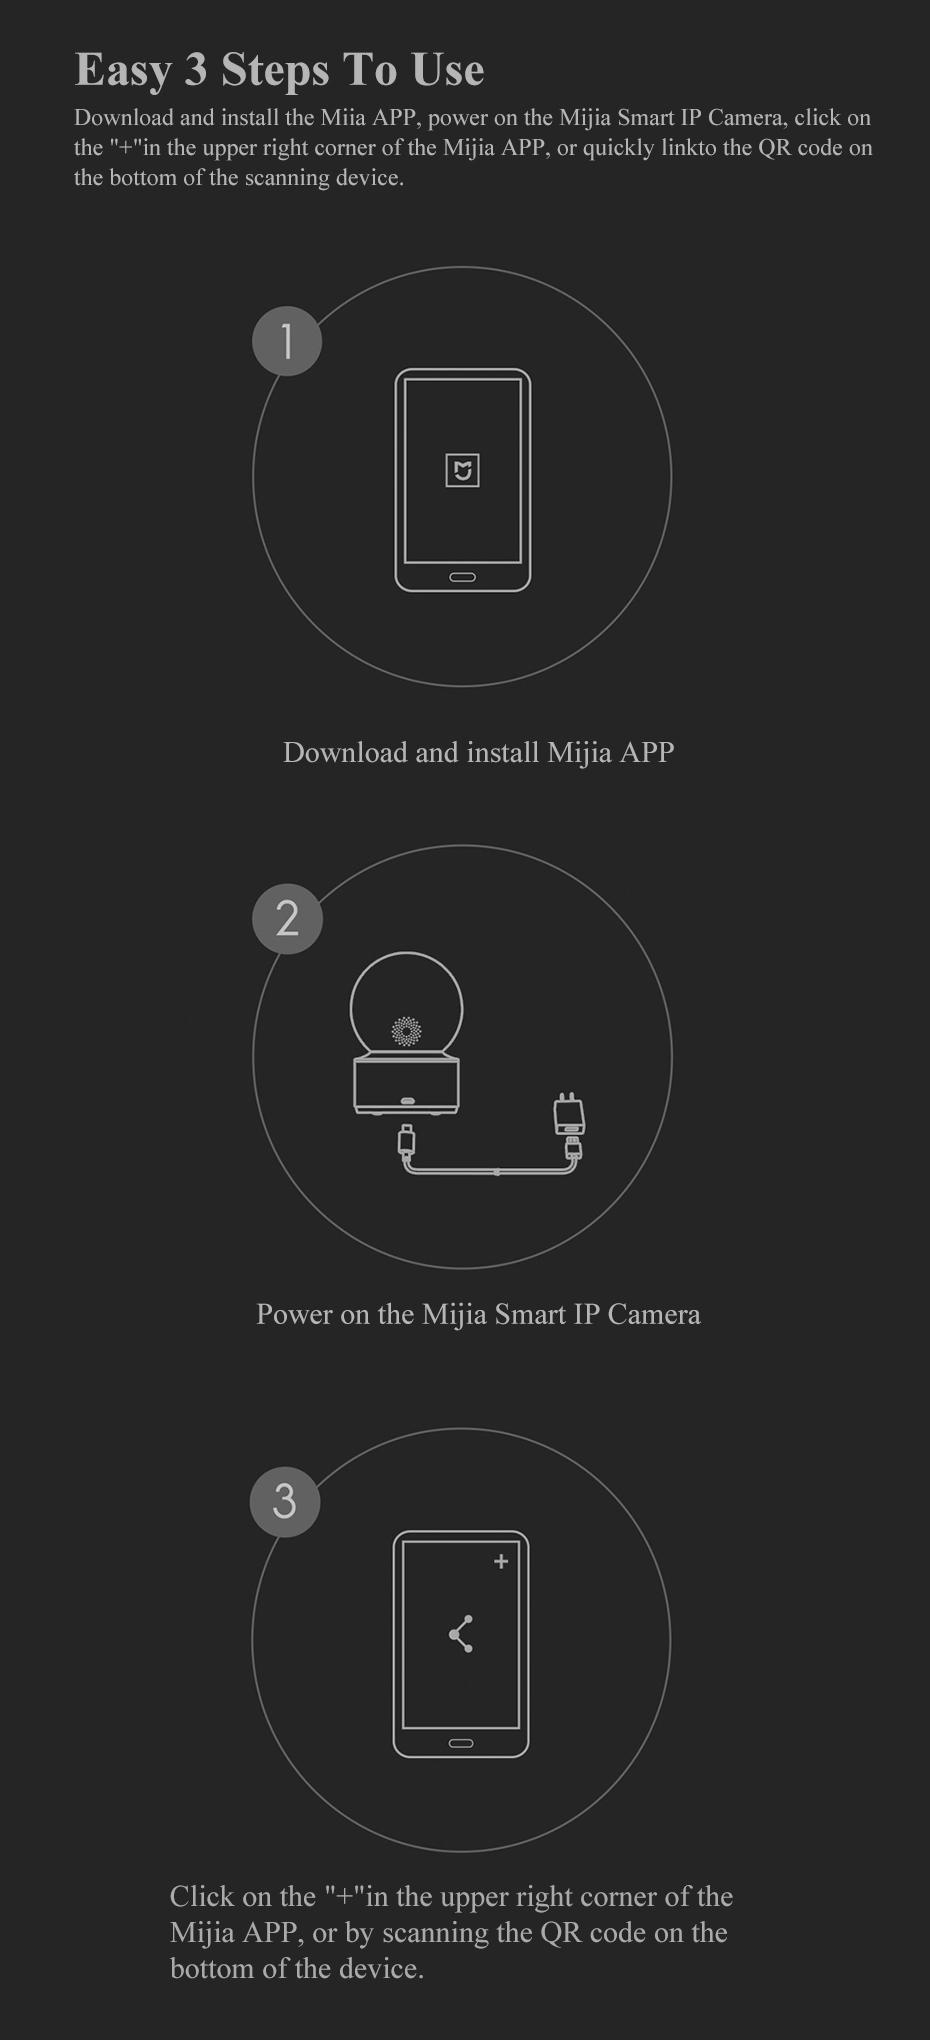 Xiaomi Mijia caméras maison intelligente caméra 1080P HD WiFi sans fil IP caméra 360 Angle vidéo CCTV nuit Webcam PTZ sécurité Mornitor